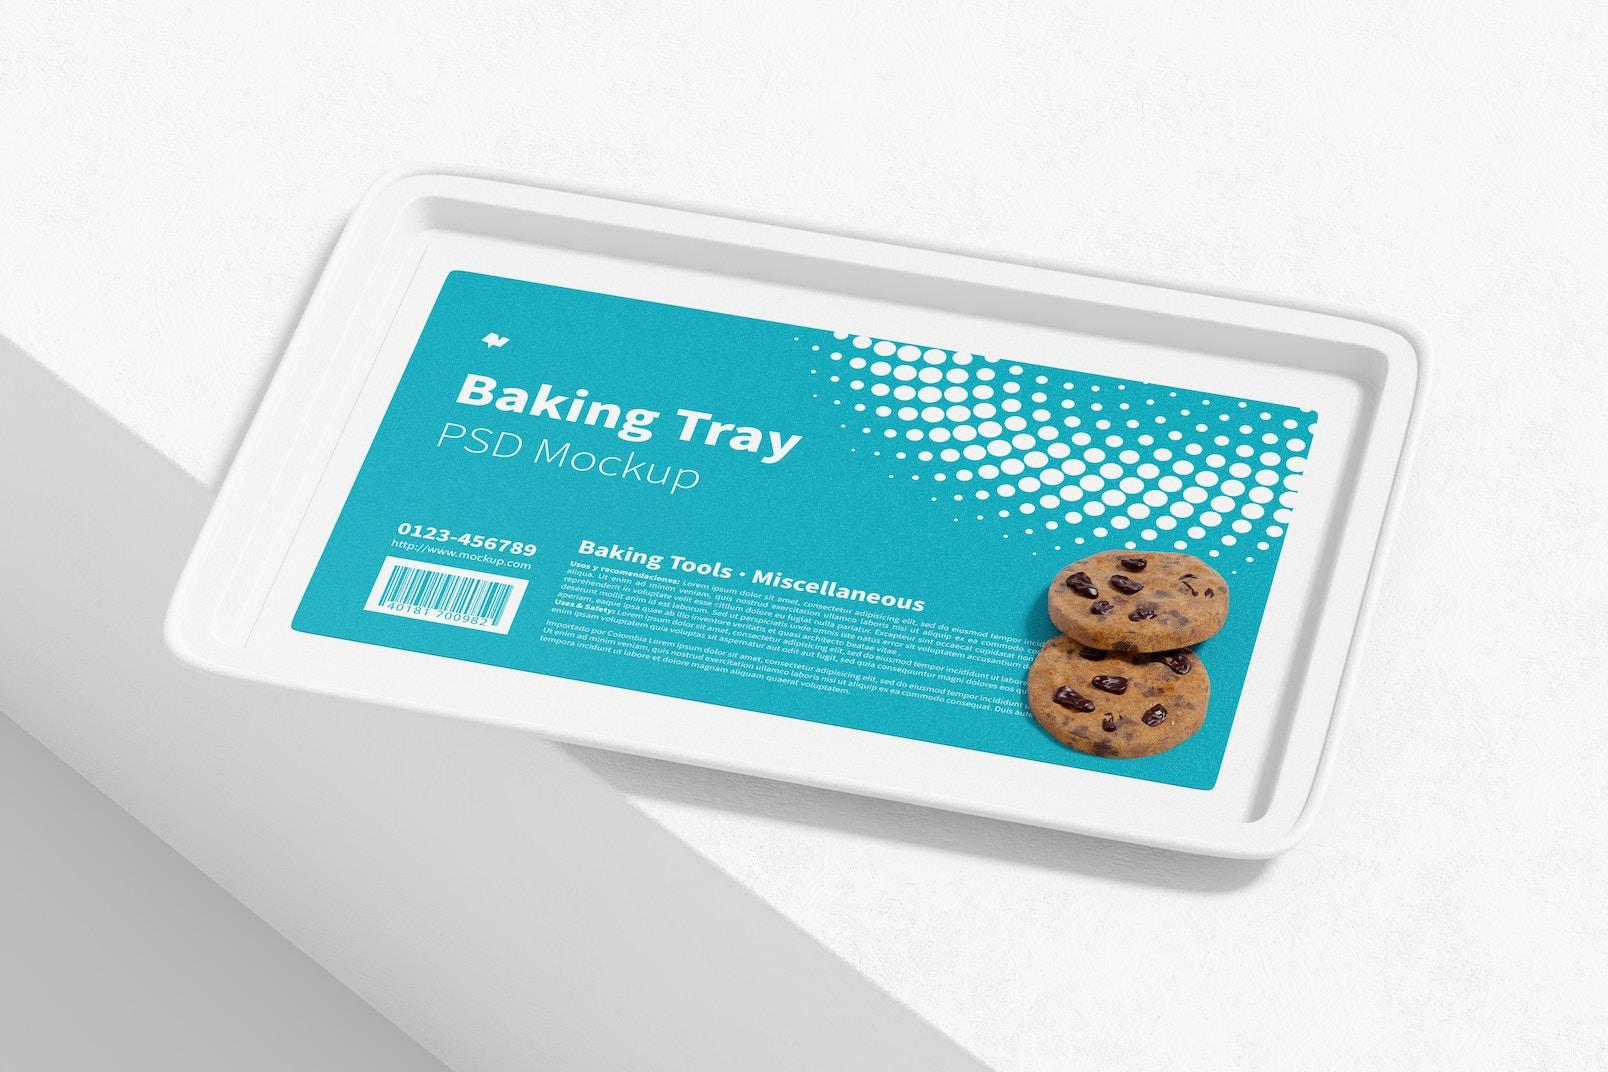 Baking Tray Mockup, Perspective View